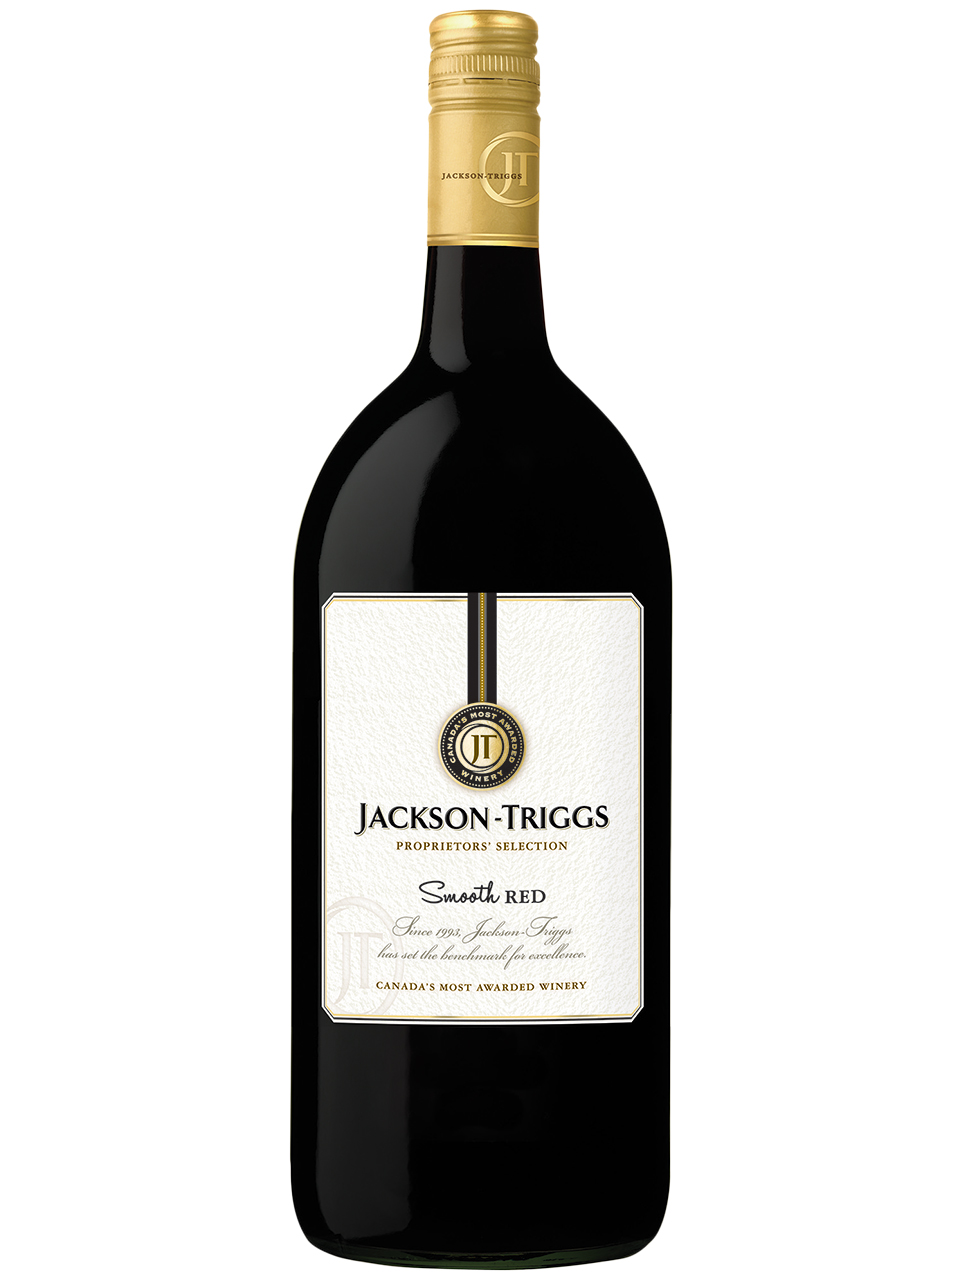 Jackson-Triggs Proprietors' Selection Smooth Red